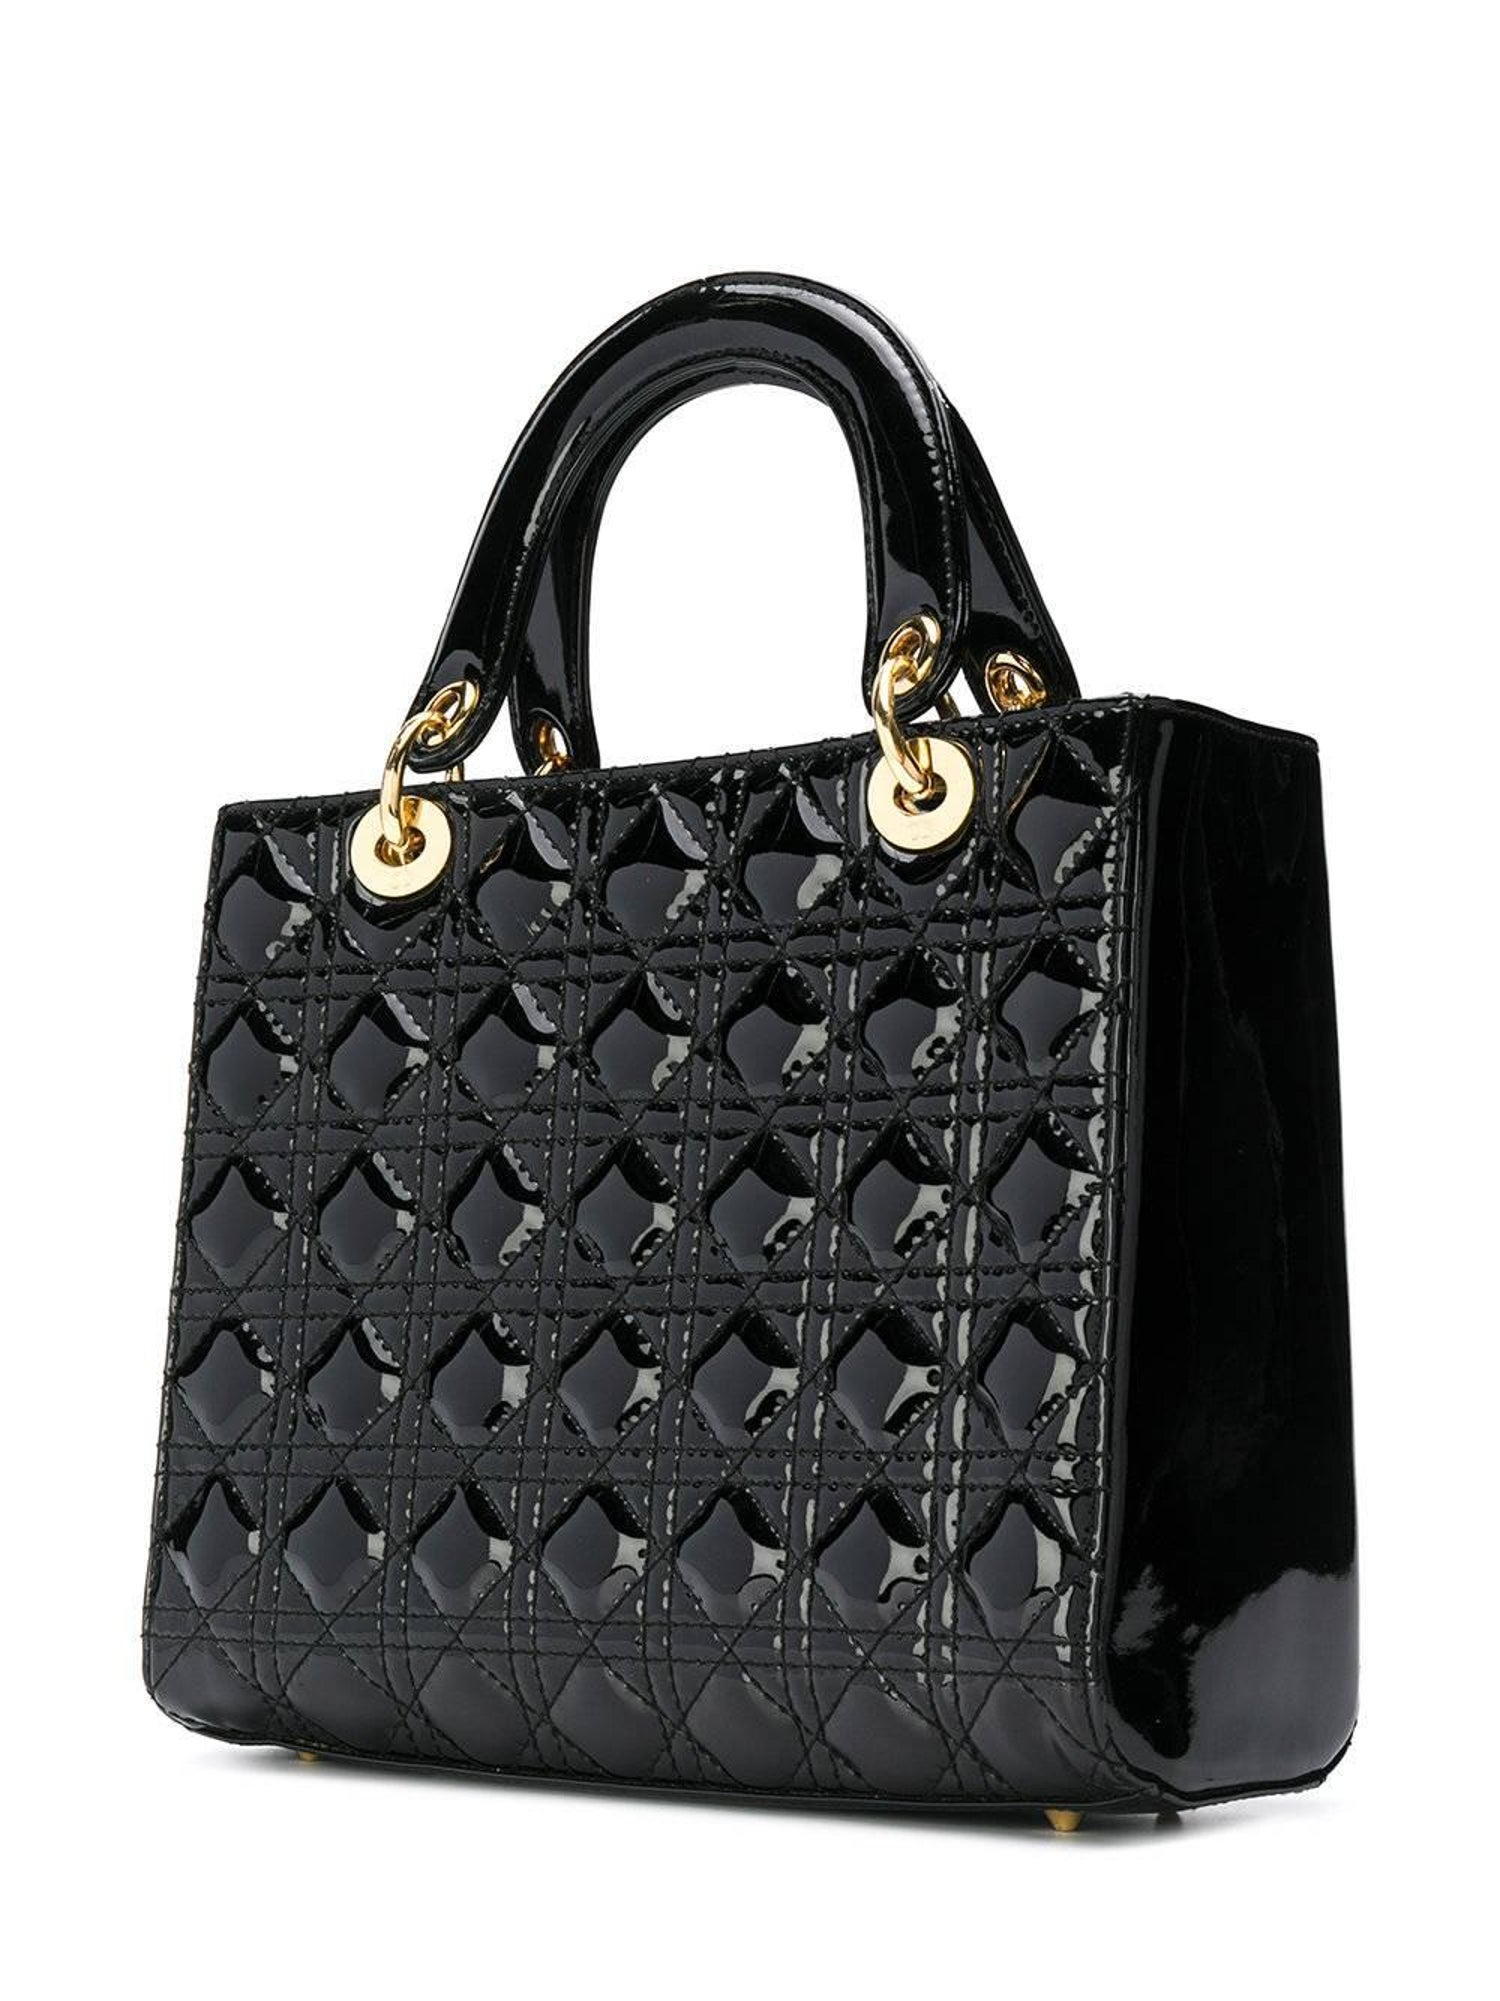 Christian Dior  Lady Dior  Handbag at 1stdibs 683e6f0f15fe0